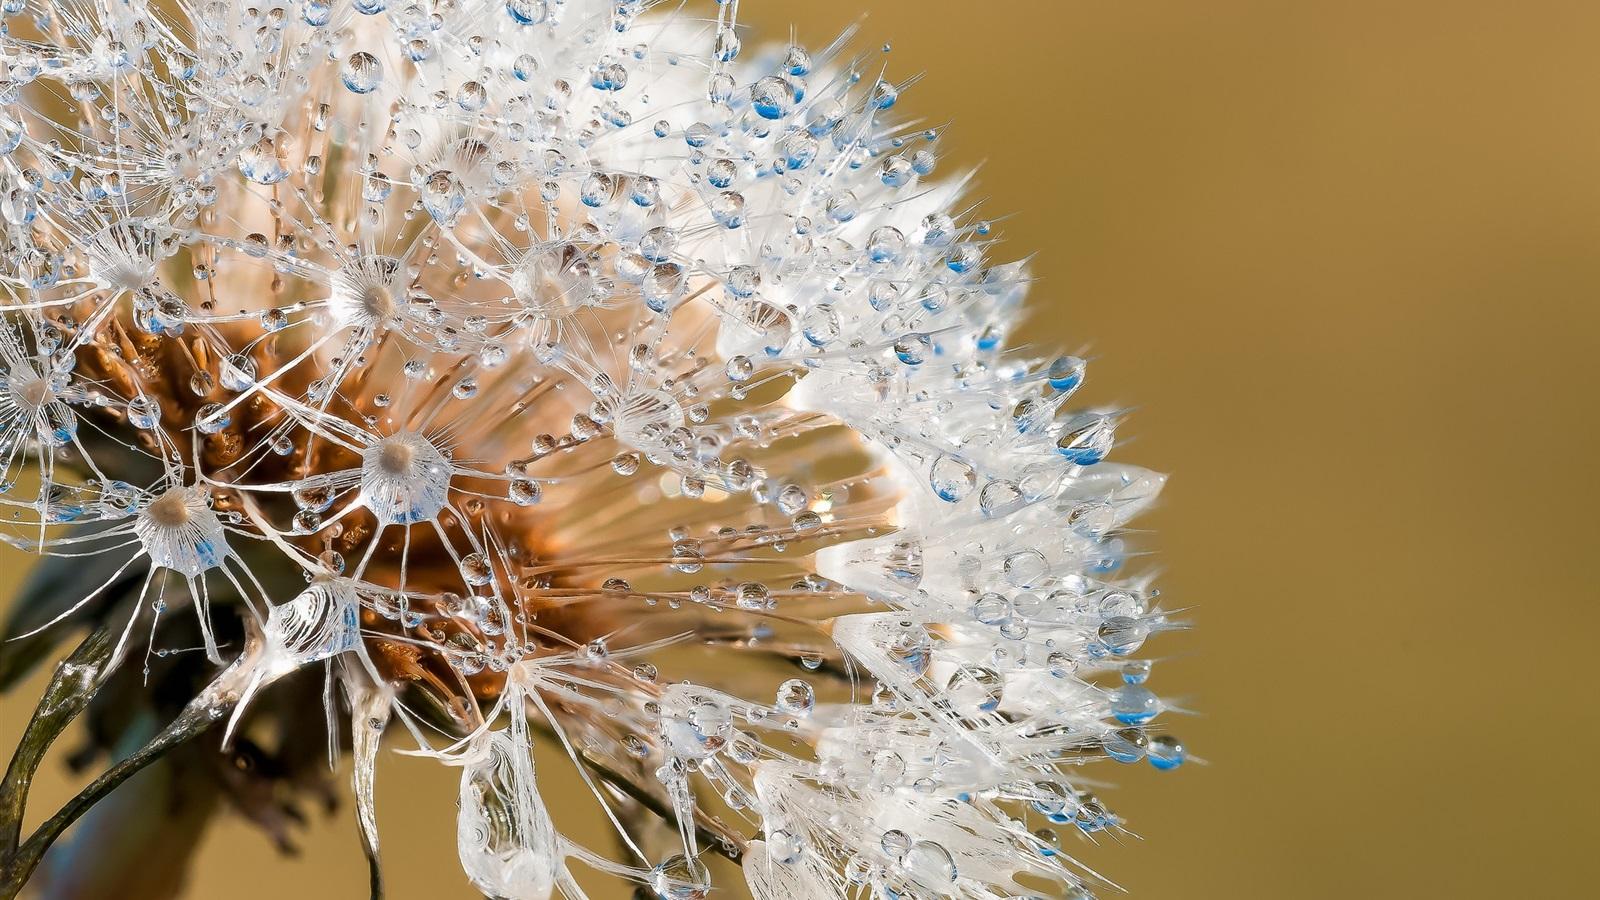 Dandelion Water Drops Macro Photography 640x1136 Iphone 5